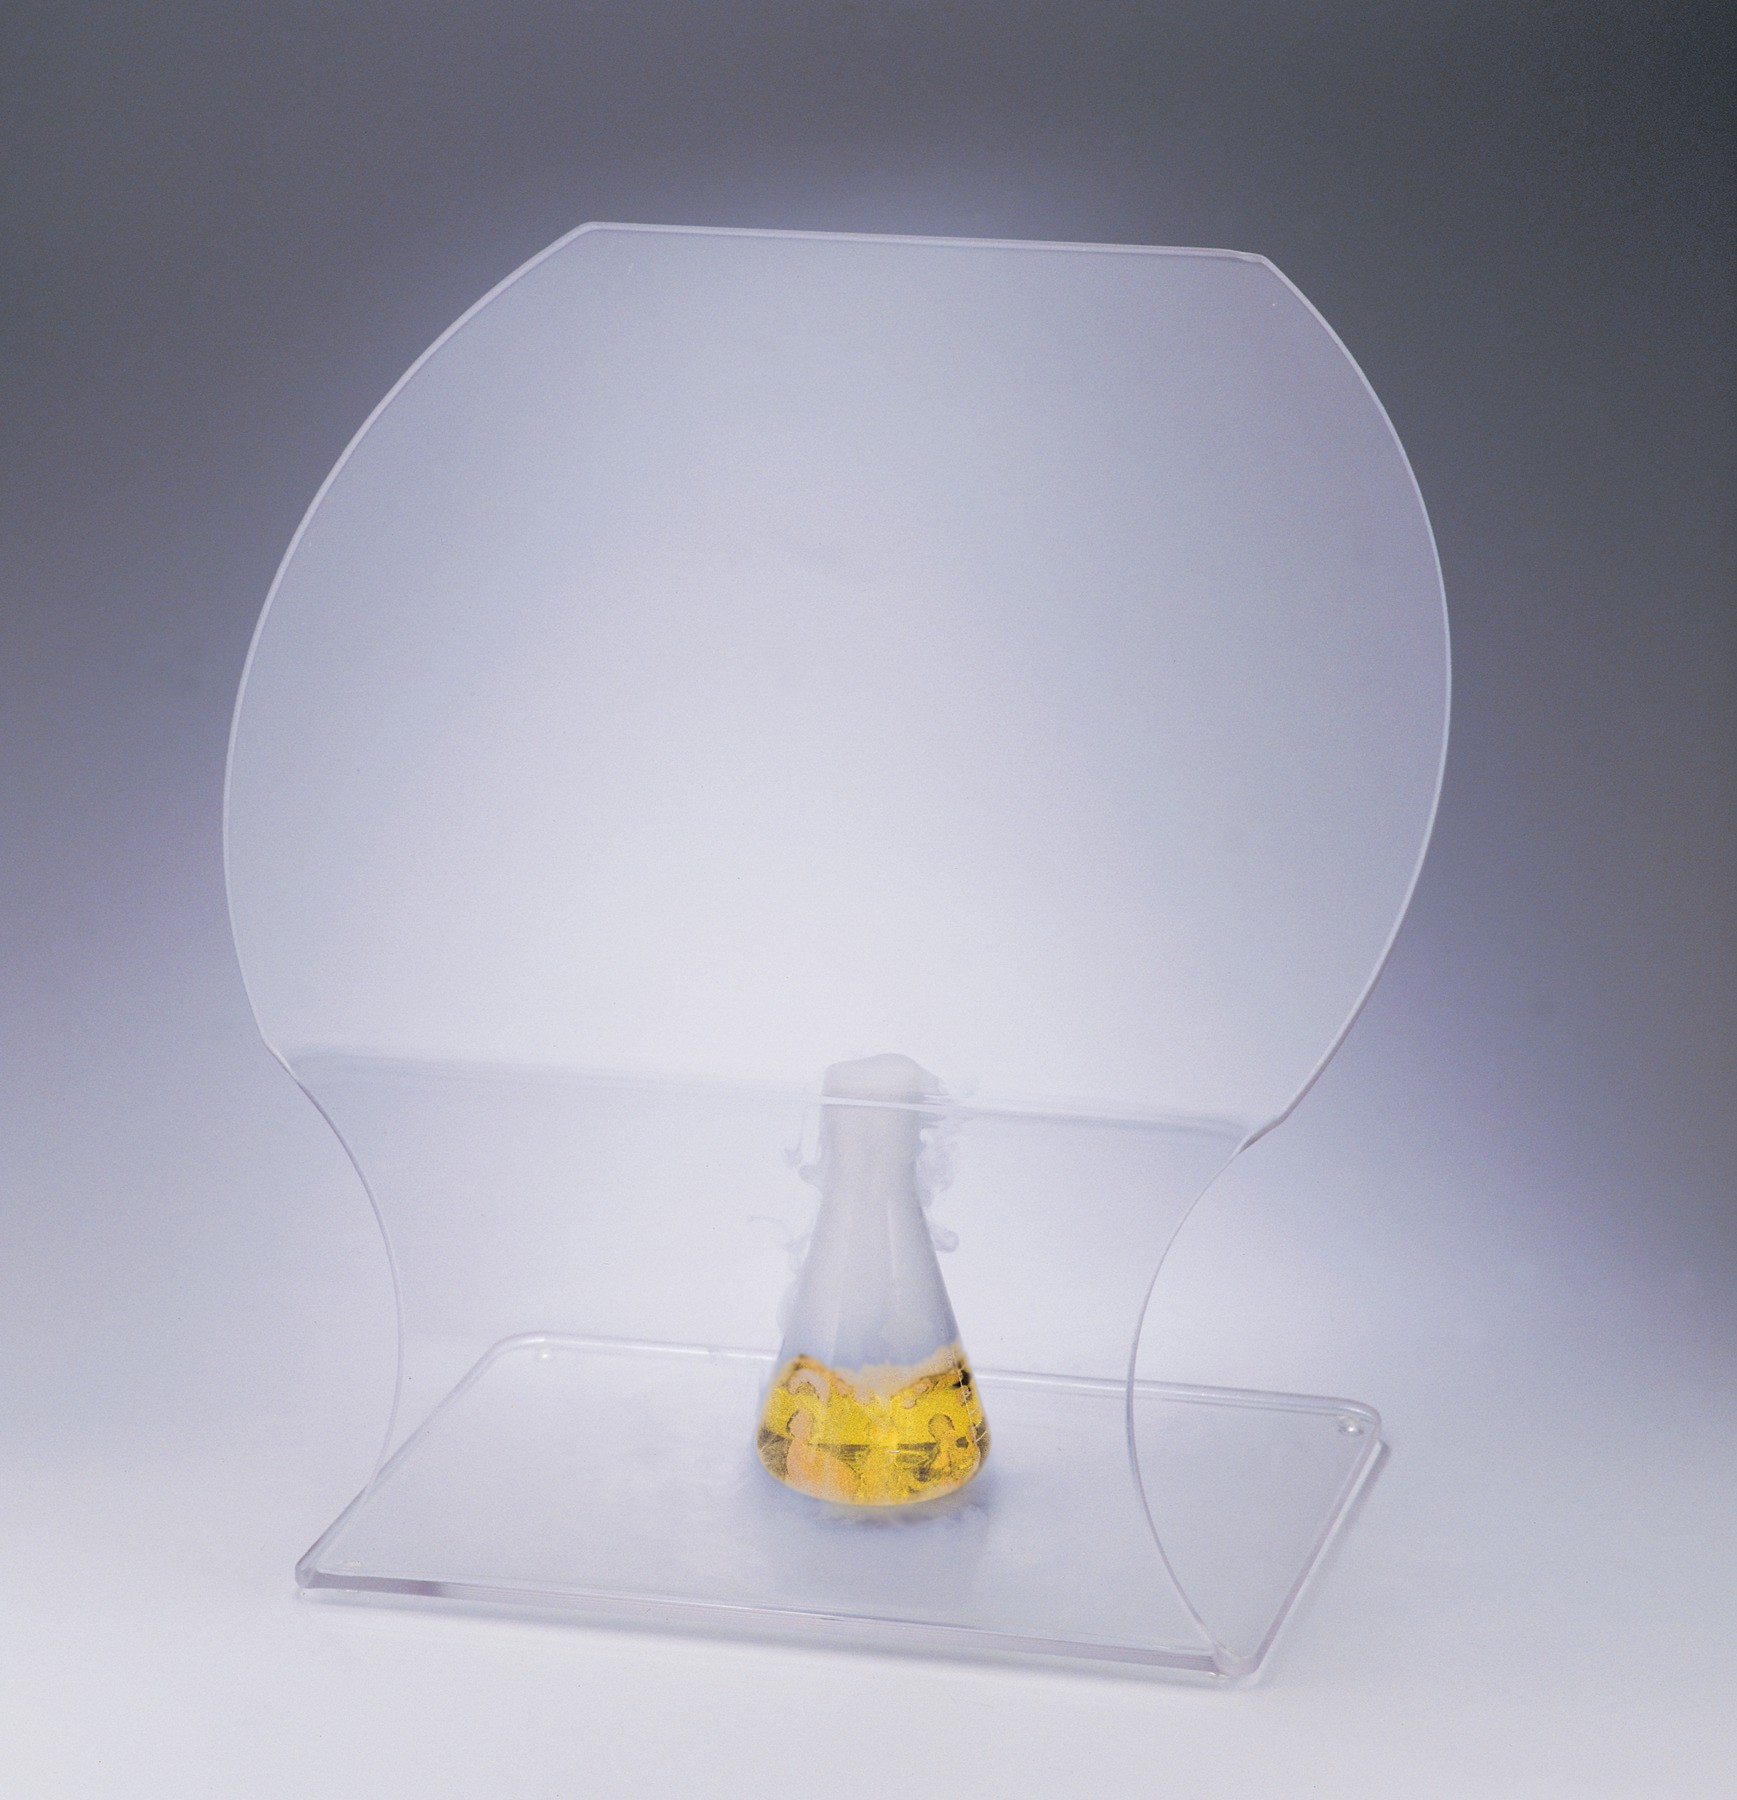 Beta Splash Shield